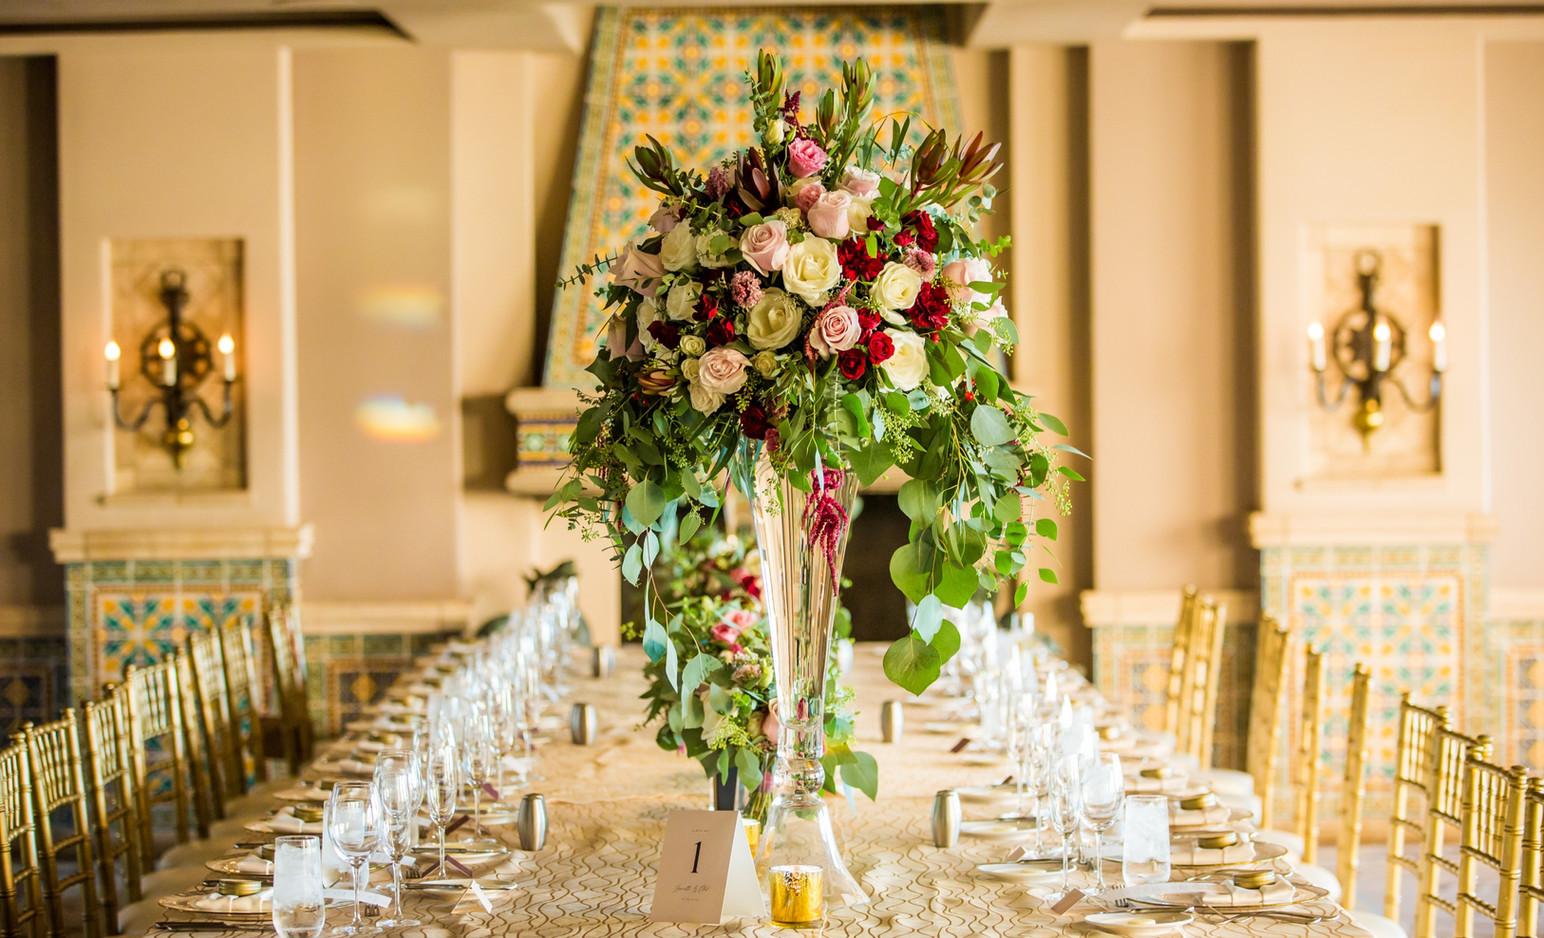 Opulent floral centerpiece for Reception